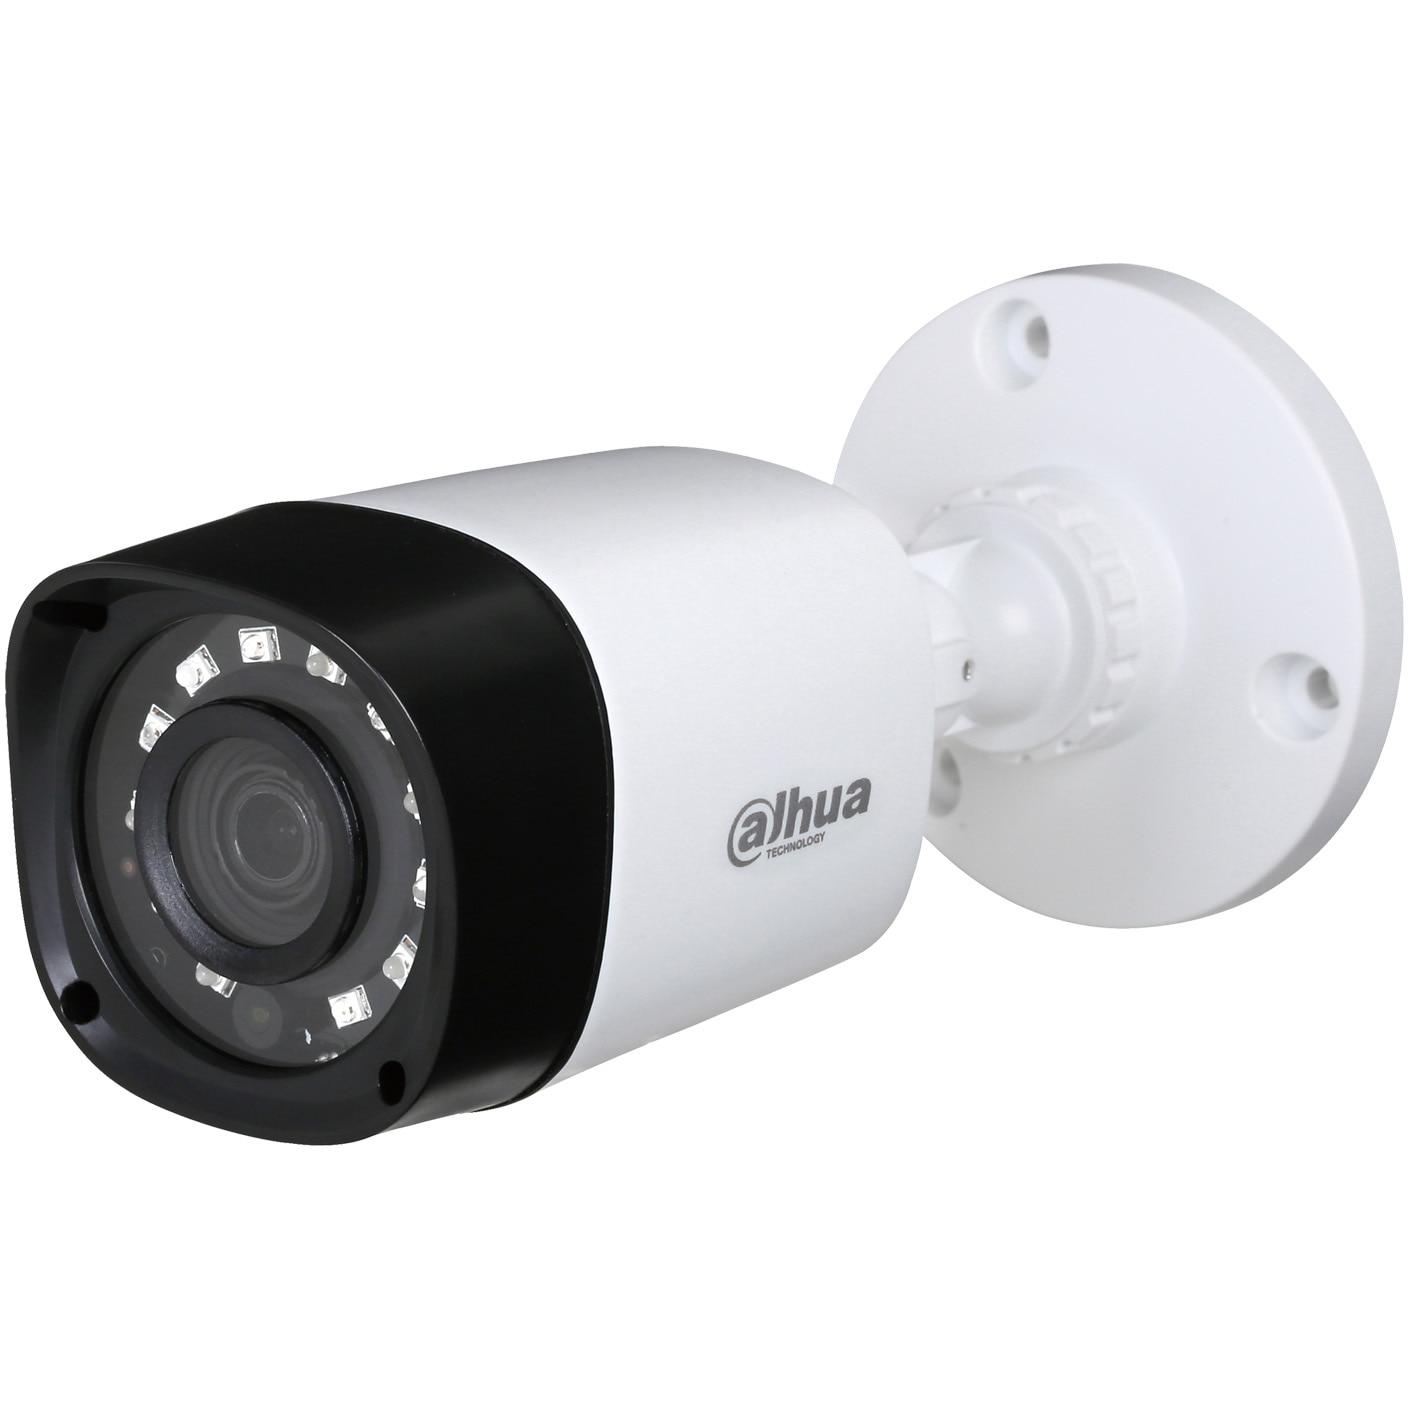 Fotografie Camera de supraveghere Dahua bullet HDCVI Dahua 5MP, 3.6mm, IR 80m, IP67